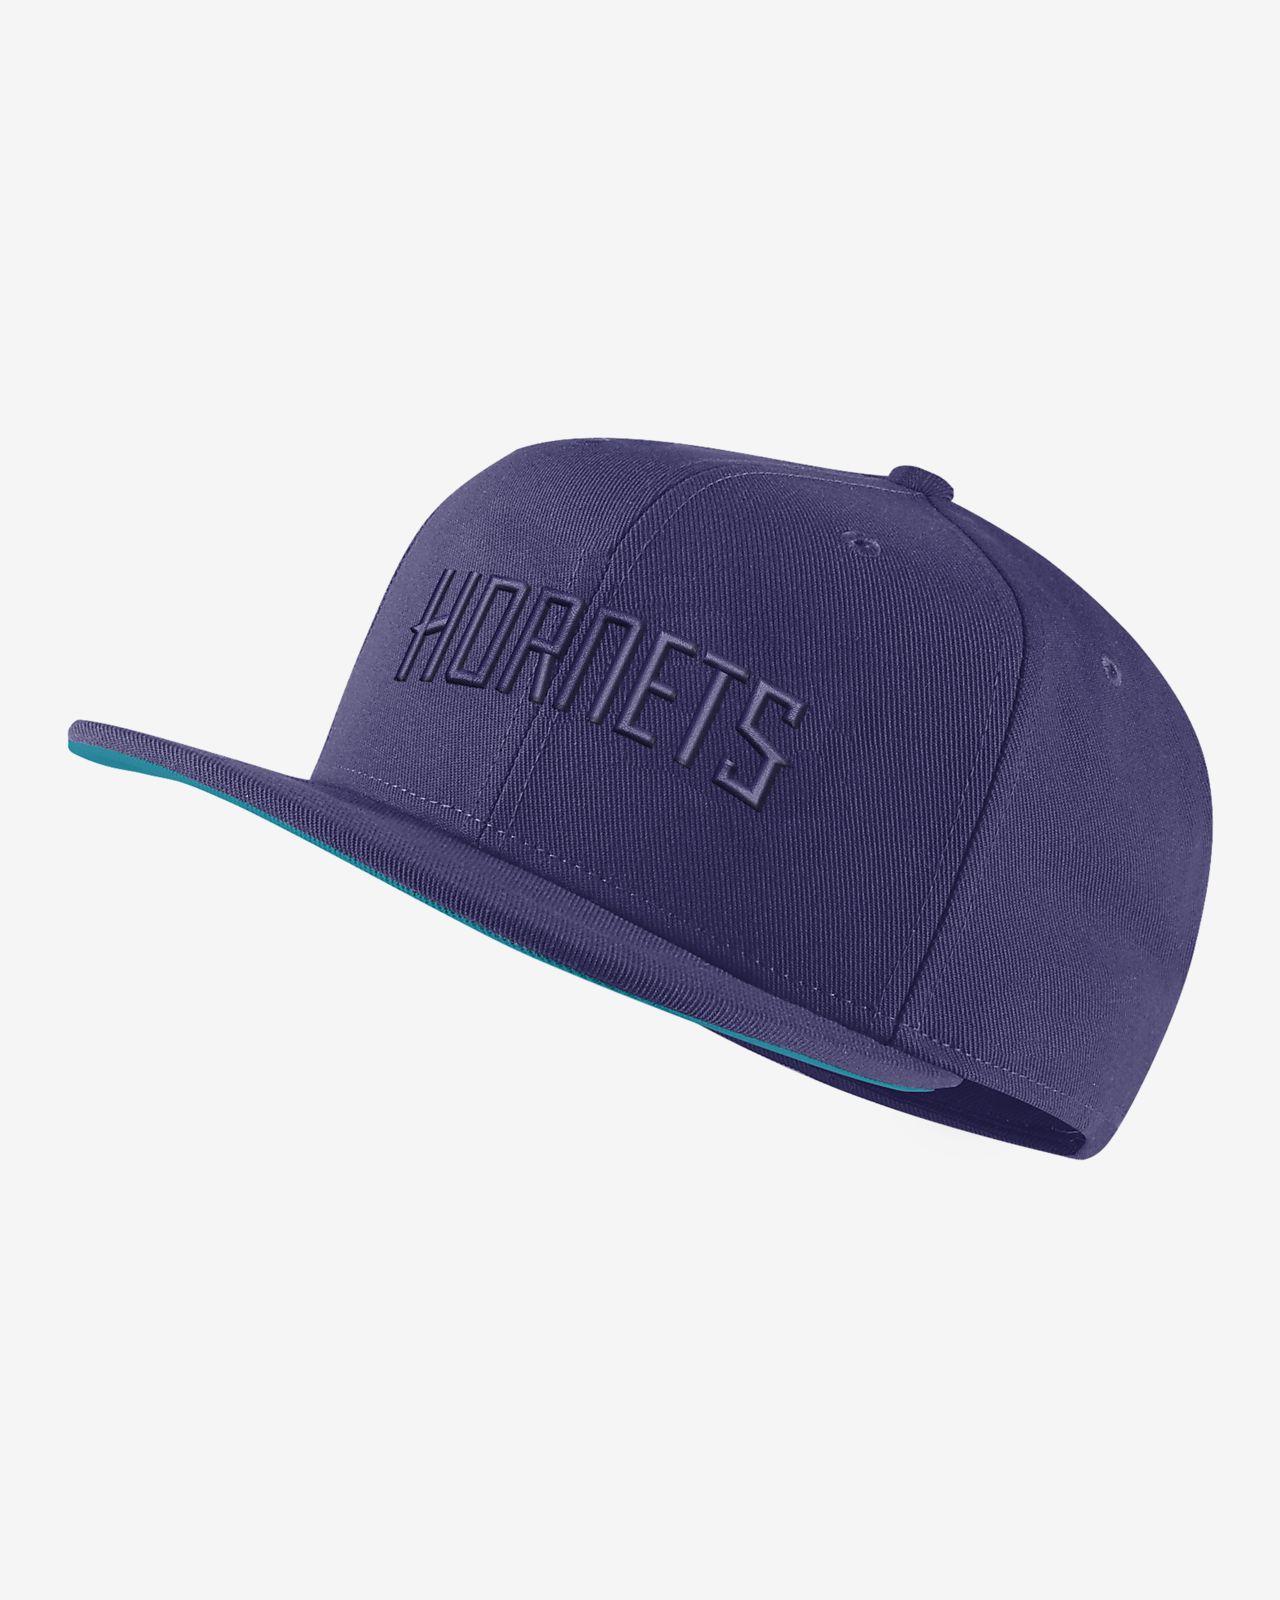 Cappello Charlotte Hornets Jordan AeroBill NBA